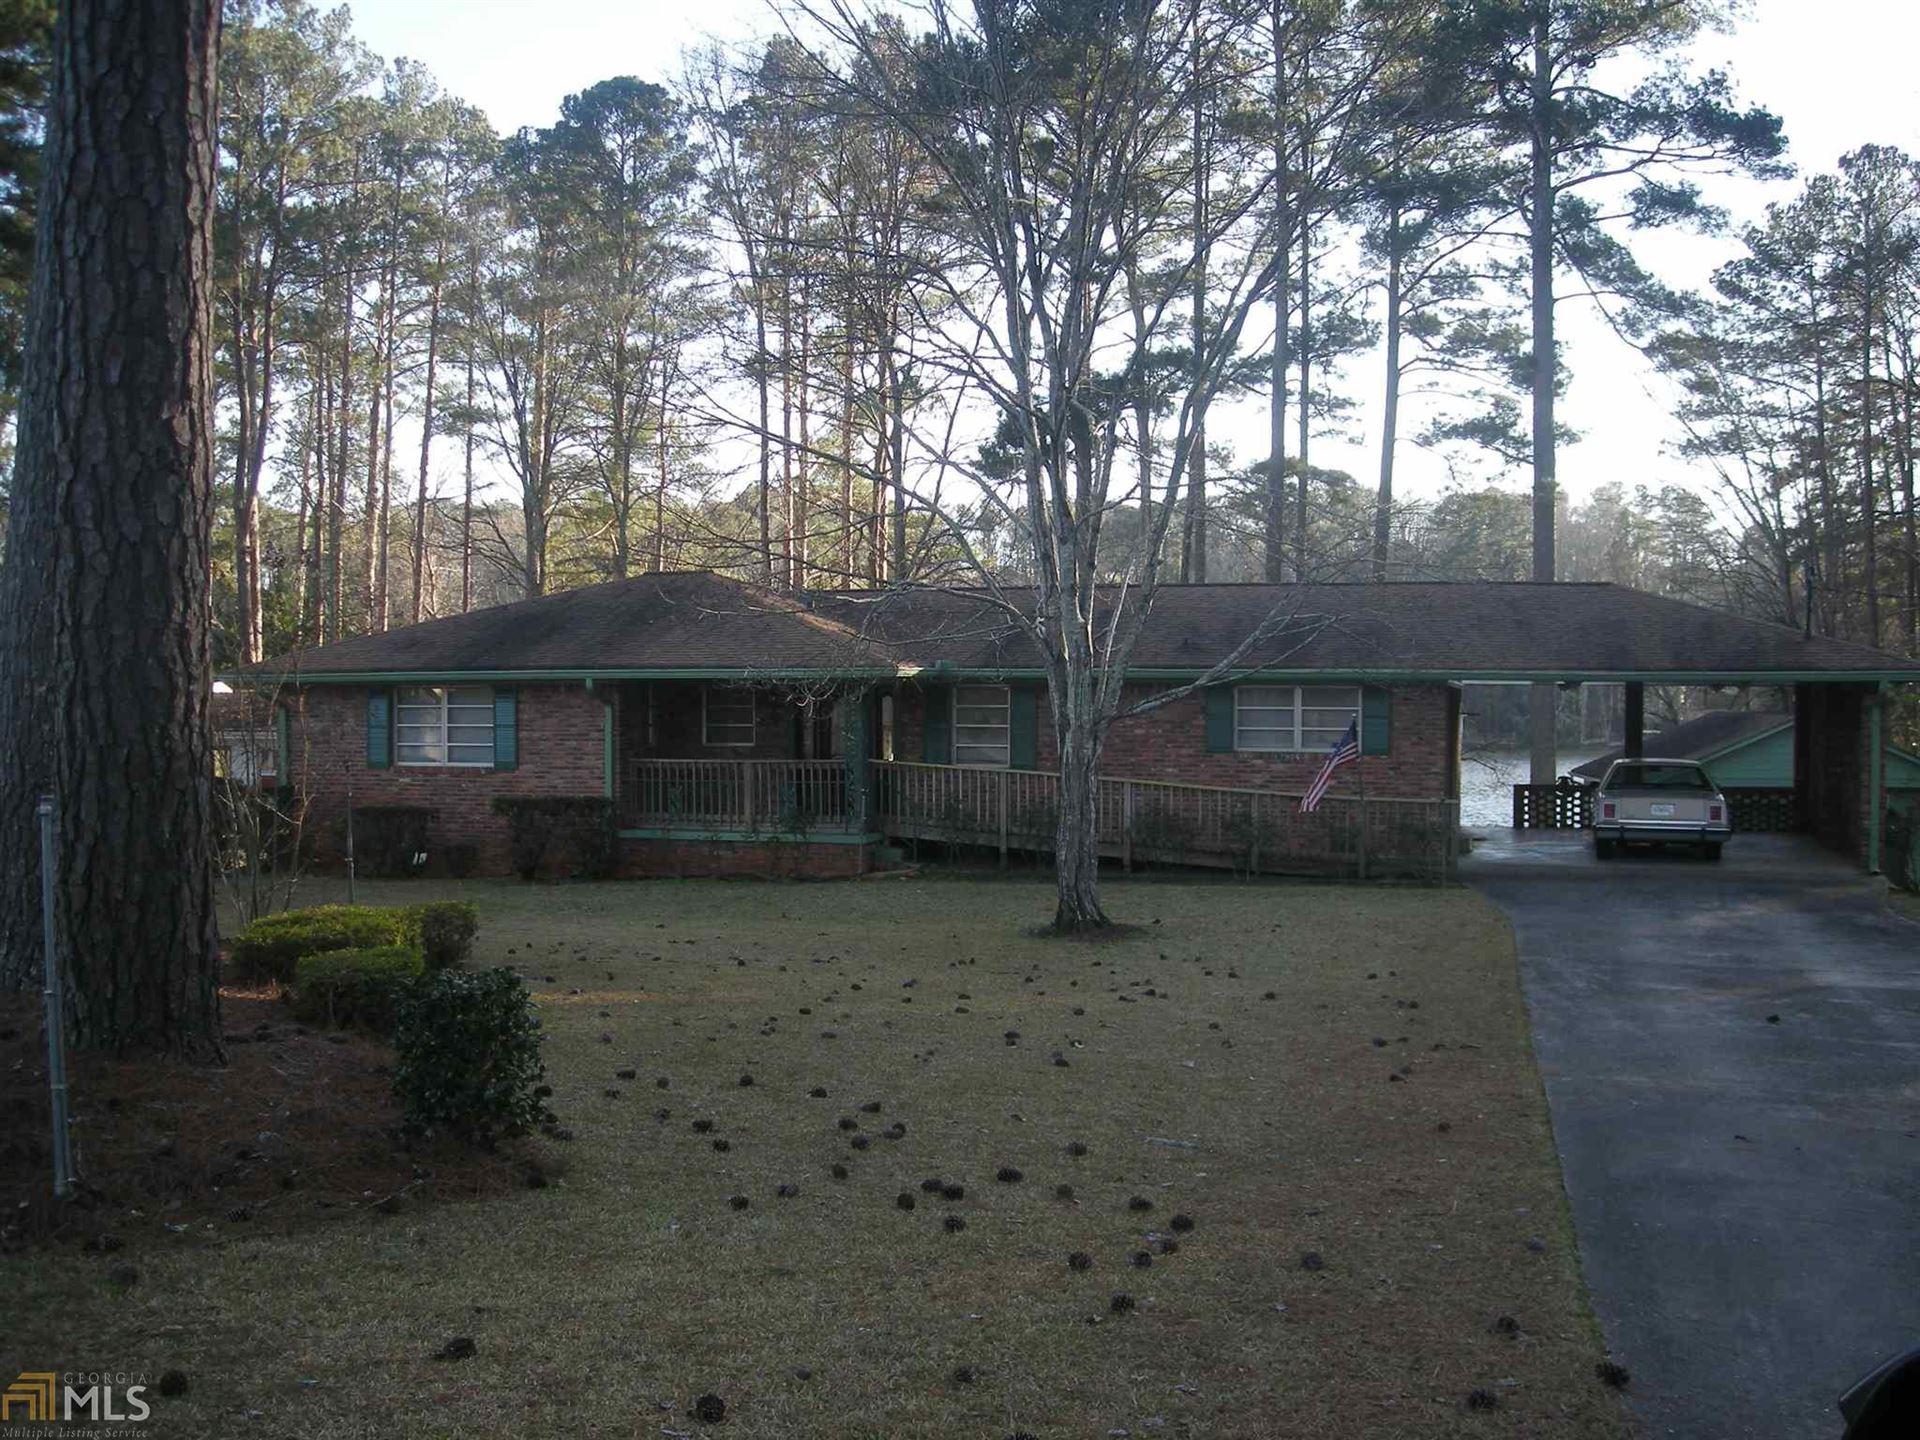 2740 Jodeco Cir, Jonesboro, GA 30236 - #: 8914202